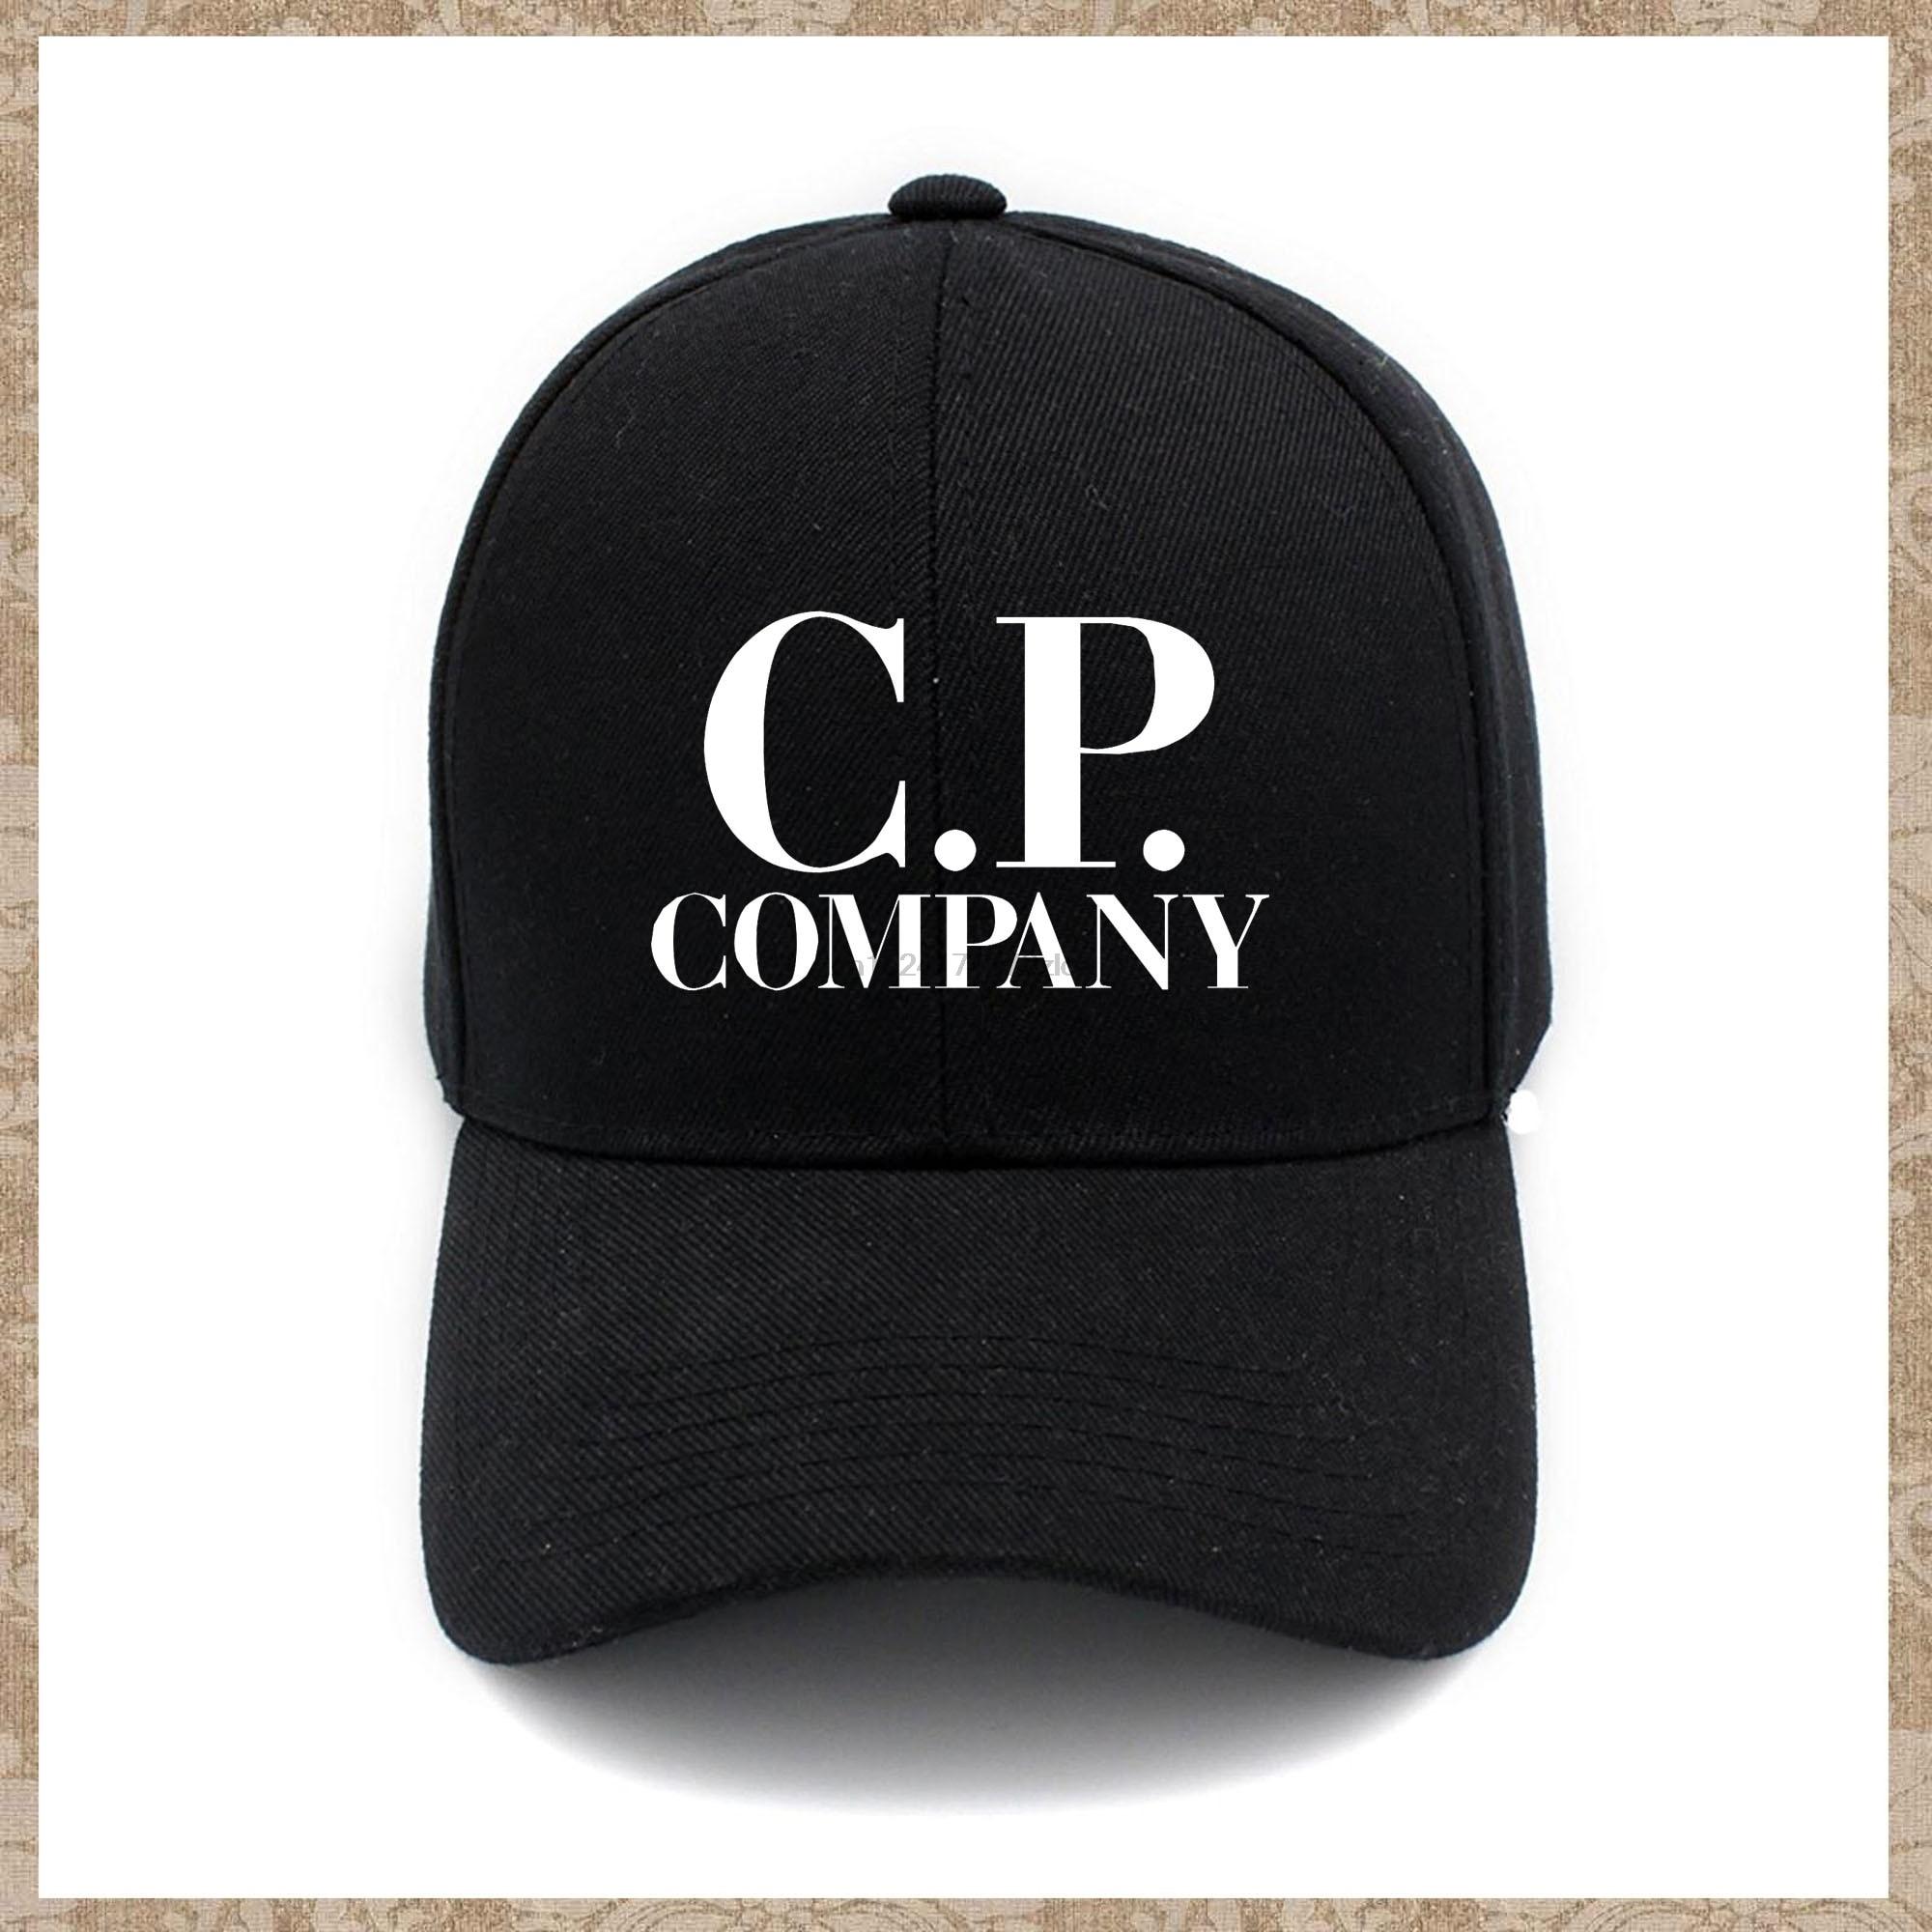 0fef2c6c C.P. Company Print Caps Adjustable Baseball Caps Cotton Hats Snapback Hats  Unisex Hats Sports Hats Outdoors Caps